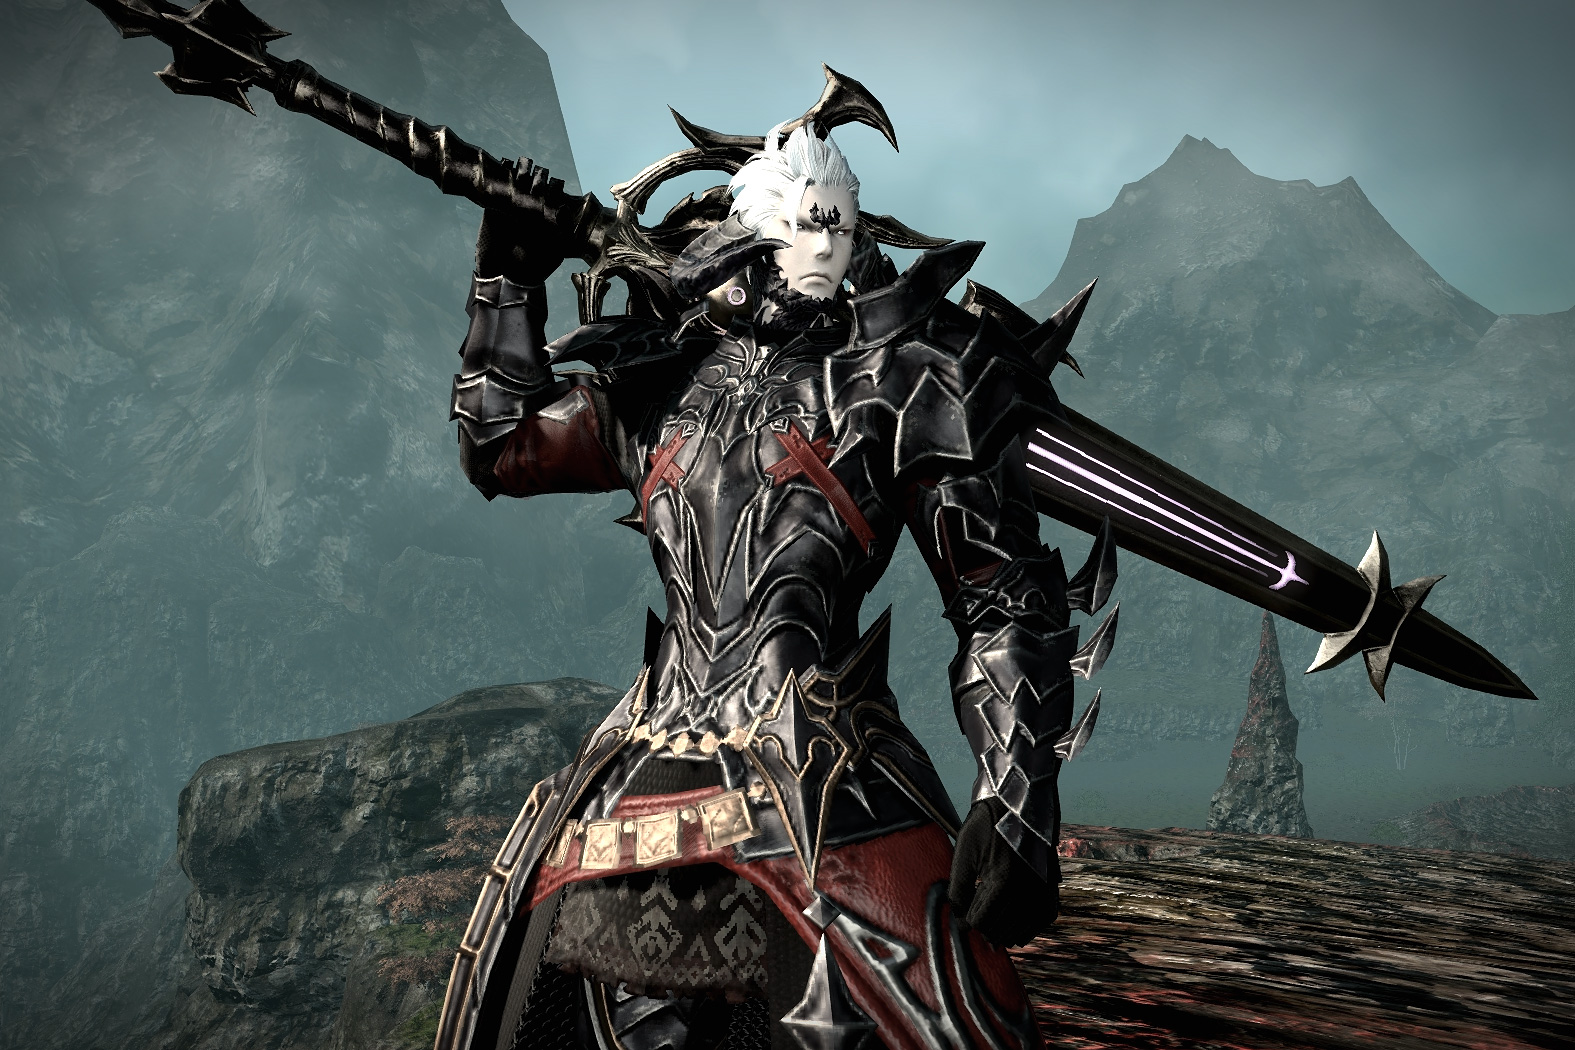 The new Dark Knight job introduced in Final Fantasy XIV: Heavensward